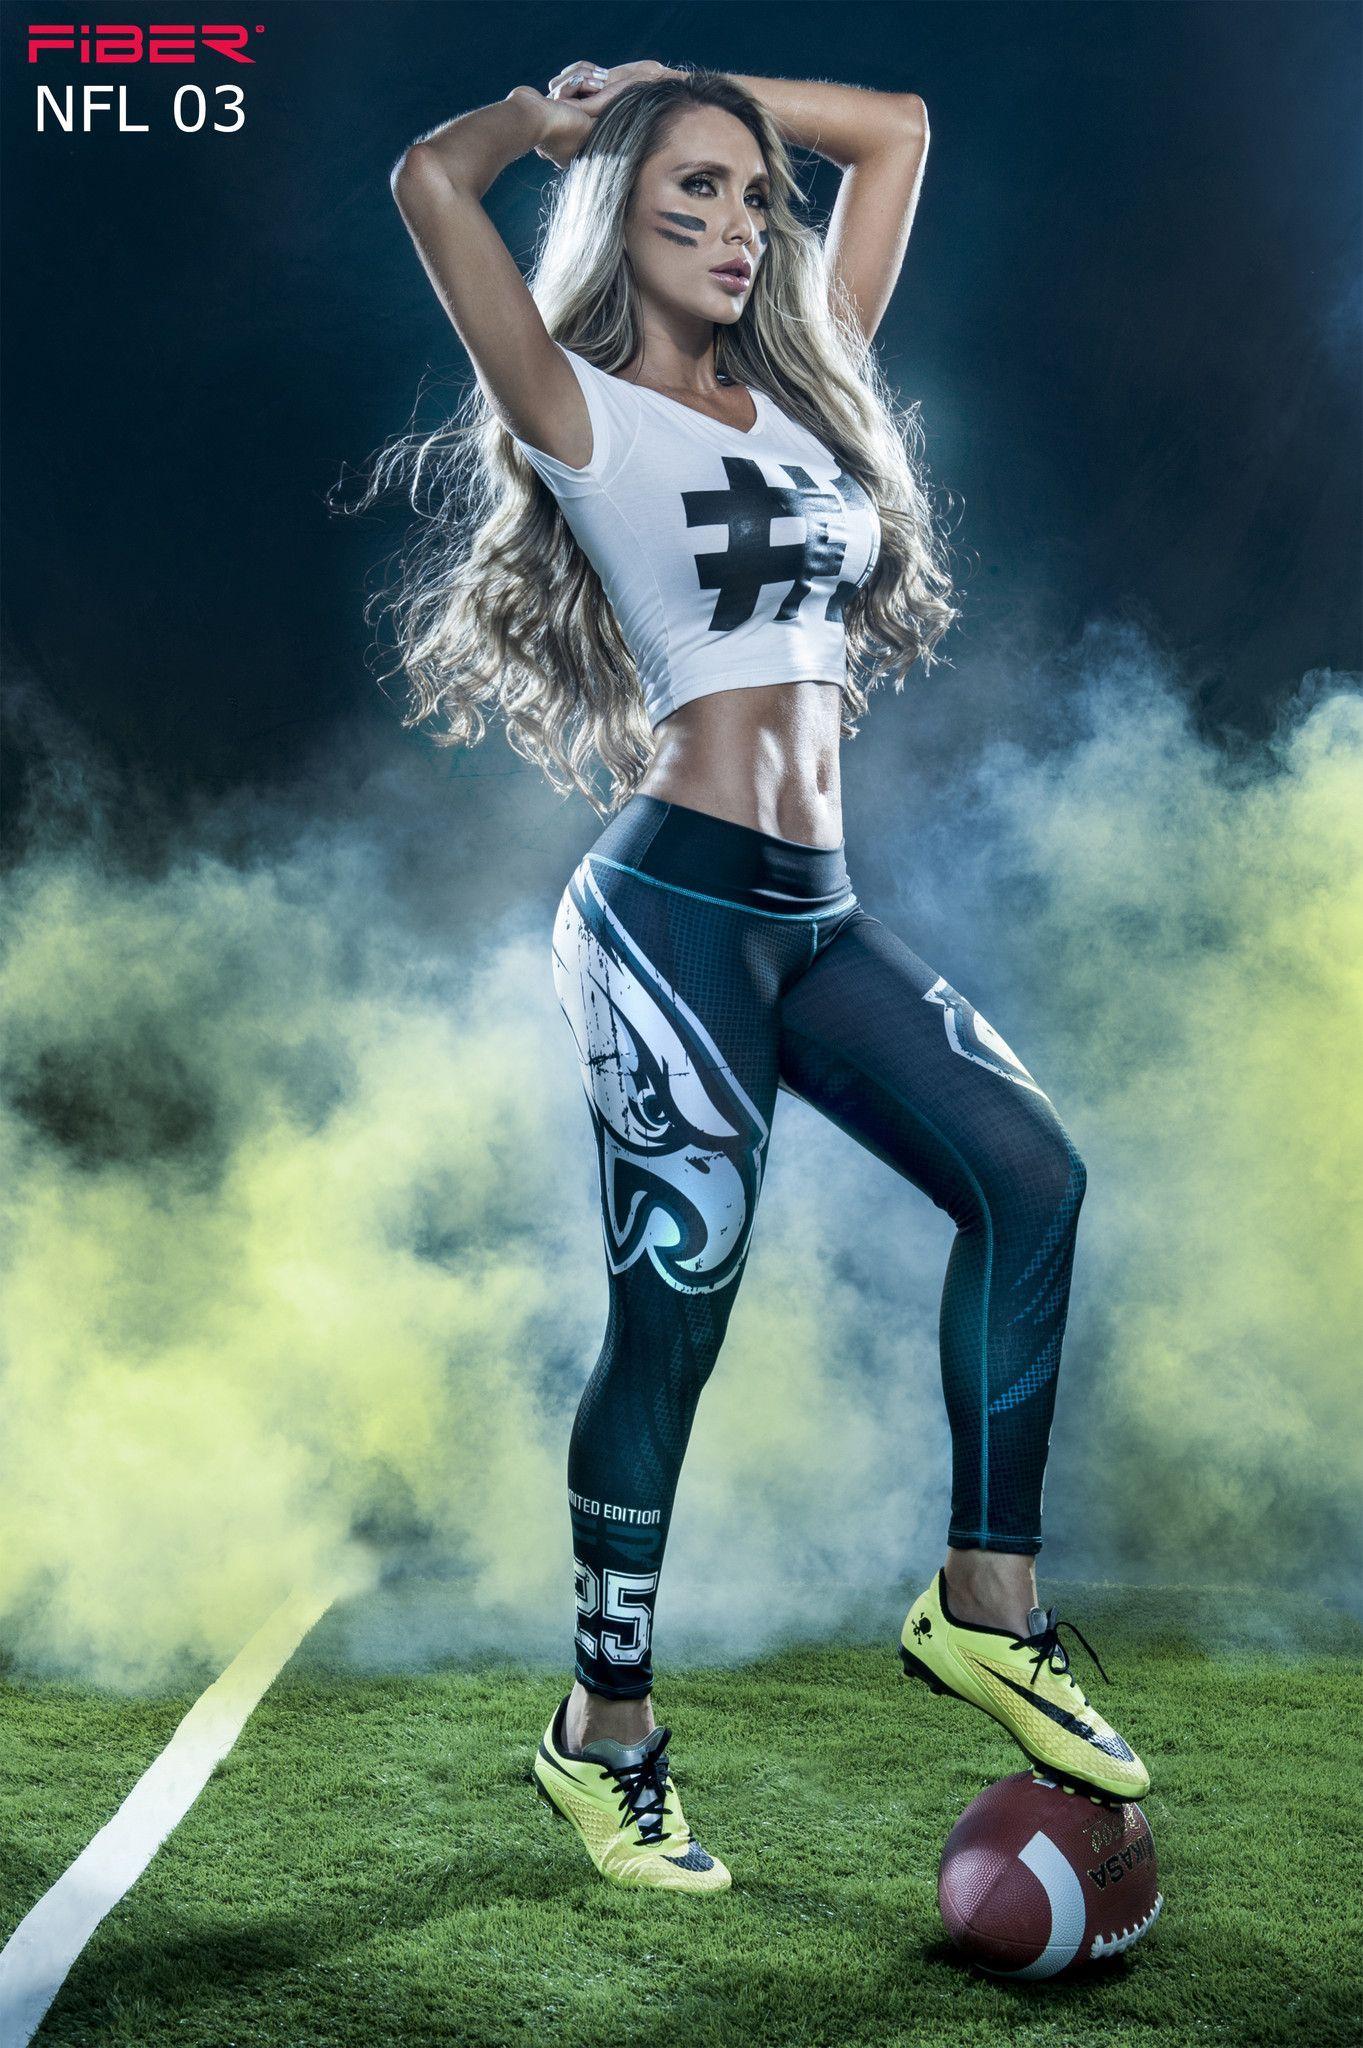 d3d64be7 Philadelphia Eagles - NFL leggings. Can i have her stomach? :/ | All ...